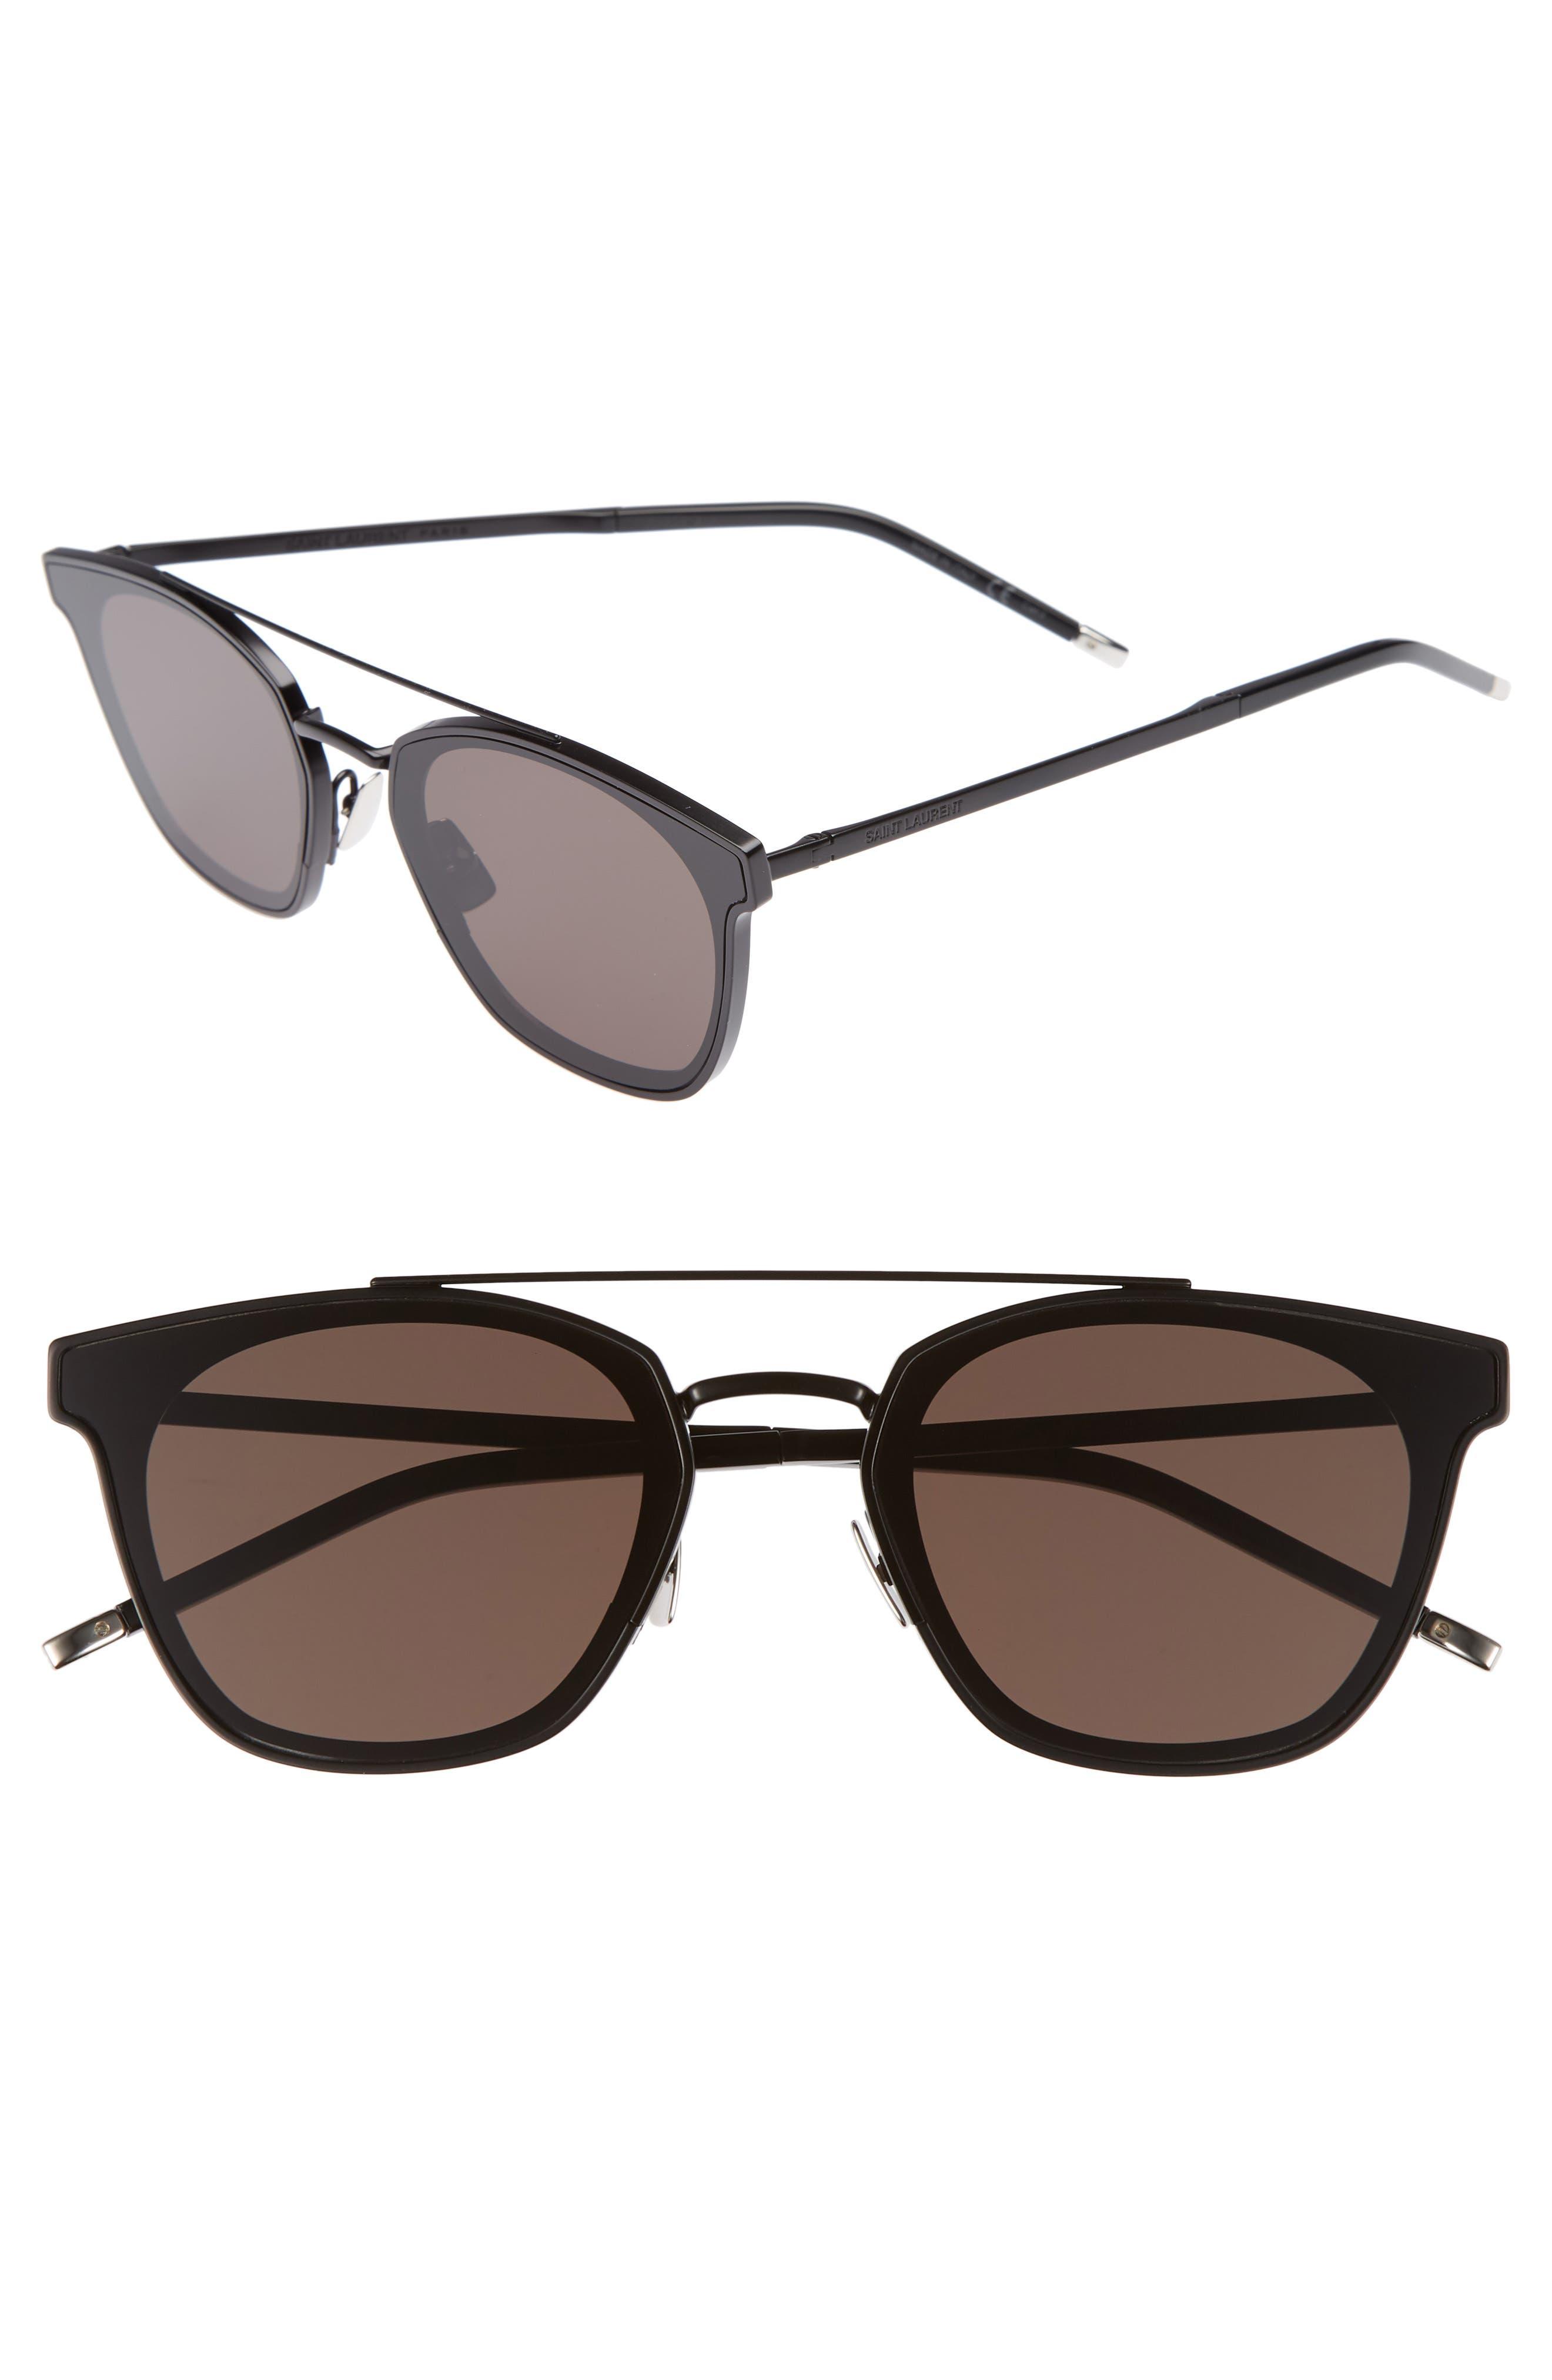 Alternate Image 1 Selected - Saint Laurent SL 28 61mm Polarized Sunglasses